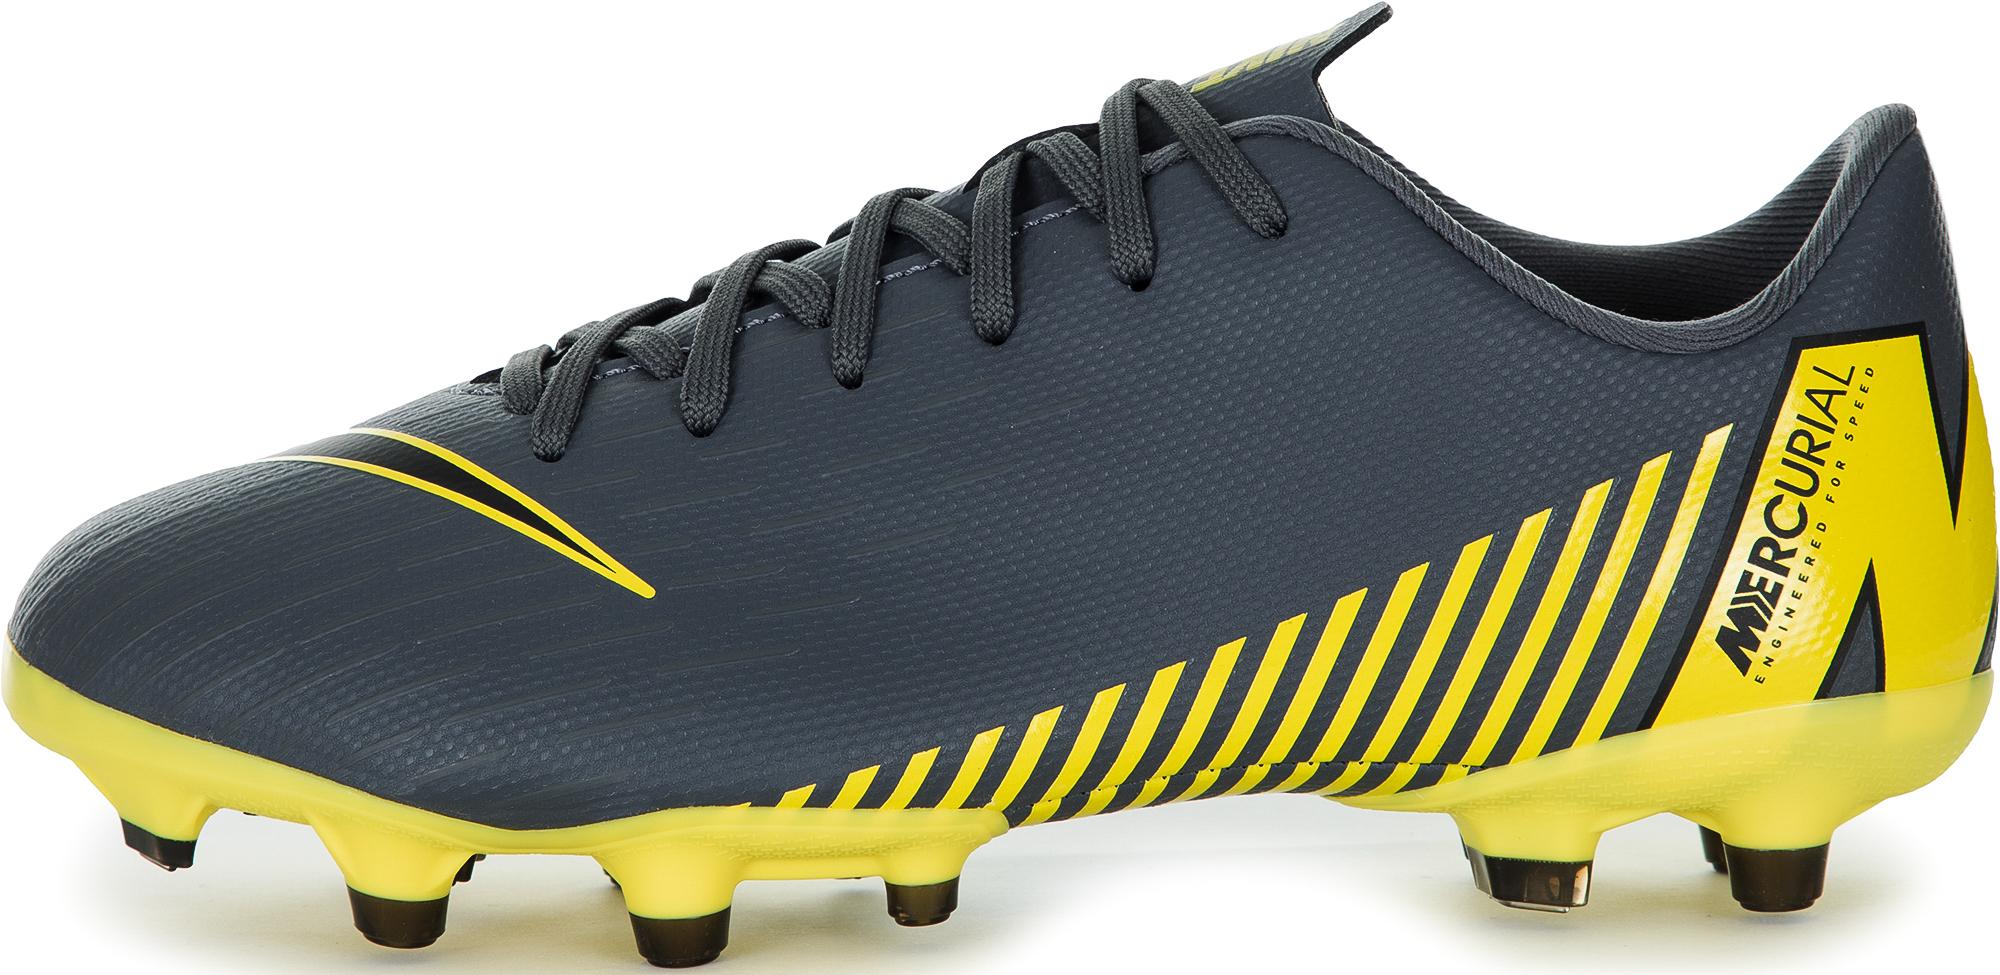 Nike Бутсы для мальчиков Nike Vapor 12 Academy GS FG/MG, размер 35,5